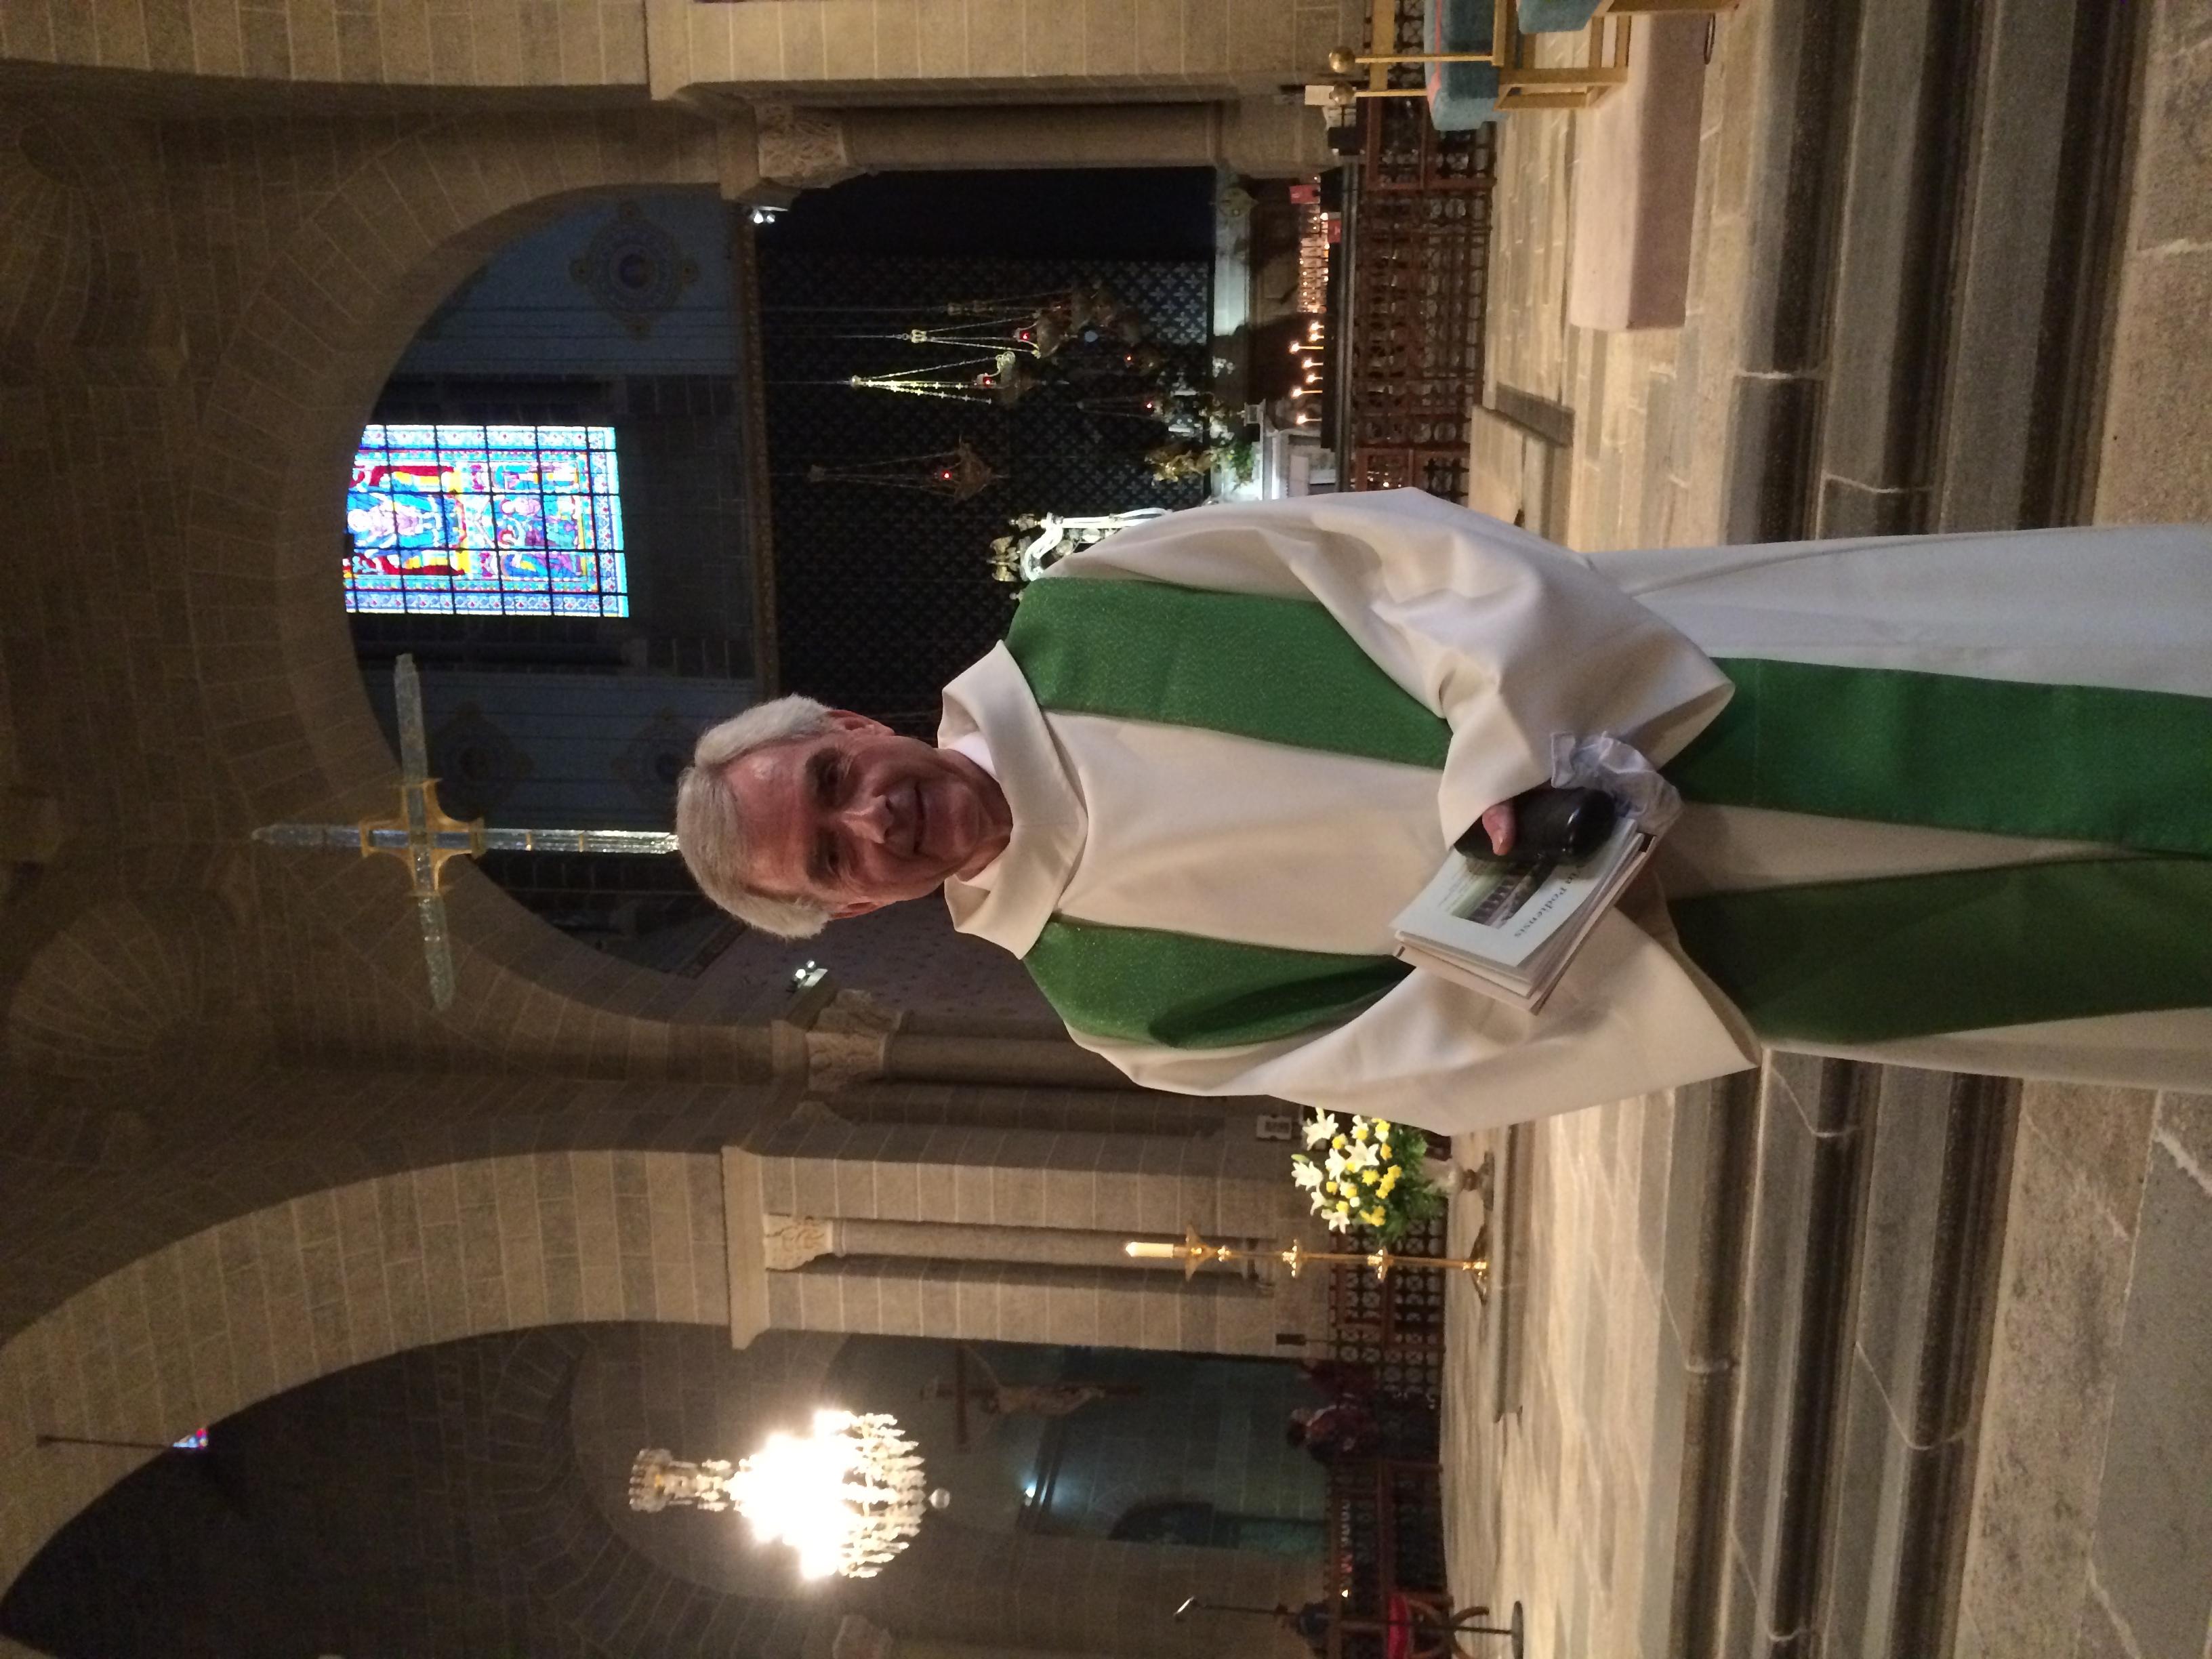 The Rev. Peter Sills